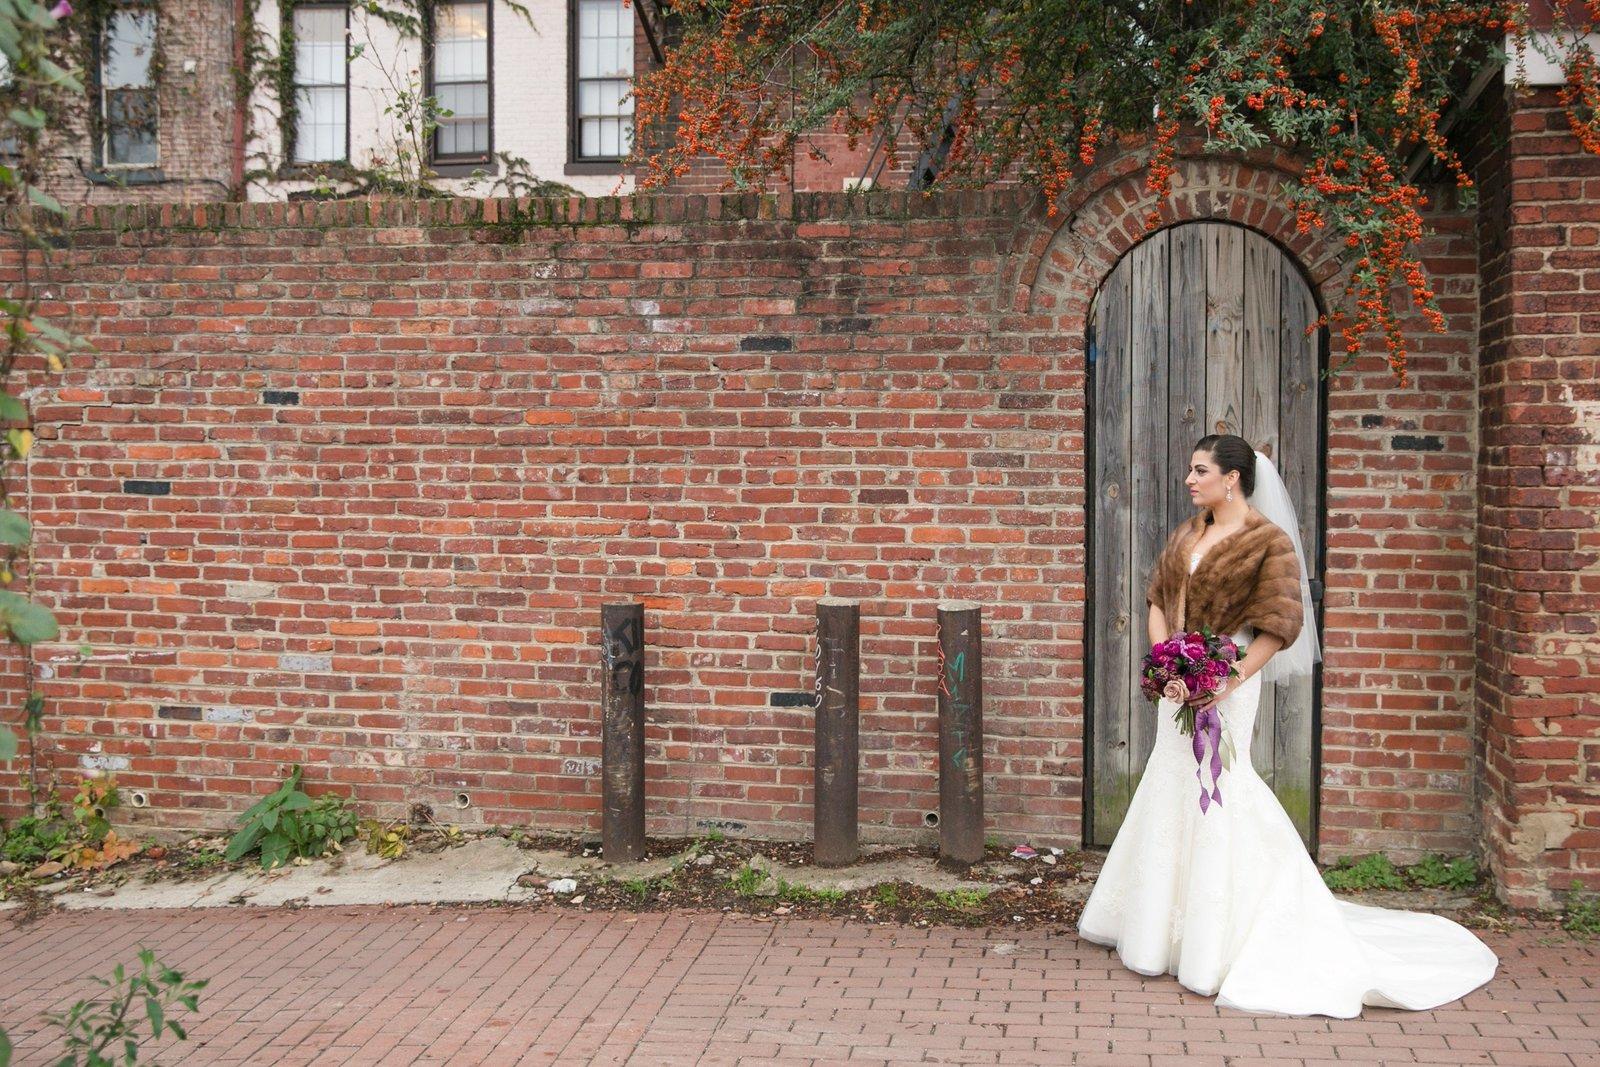 Black-tie-wedding-photos-longview-gallery-dc (158)